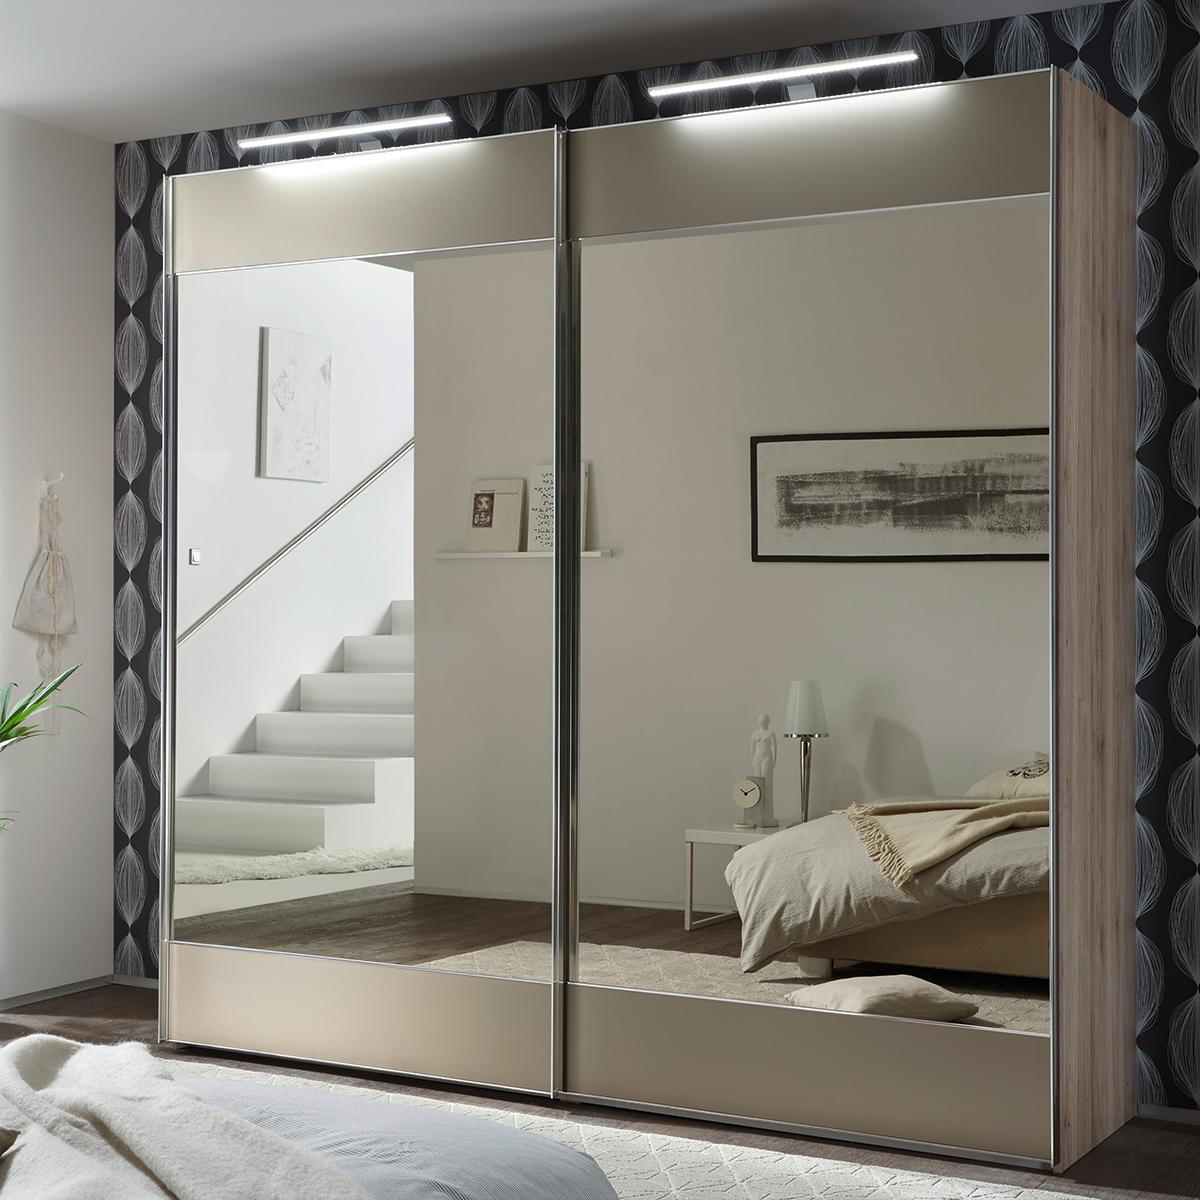 schwebet renschrank polino flamme. Black Bedroom Furniture Sets. Home Design Ideas